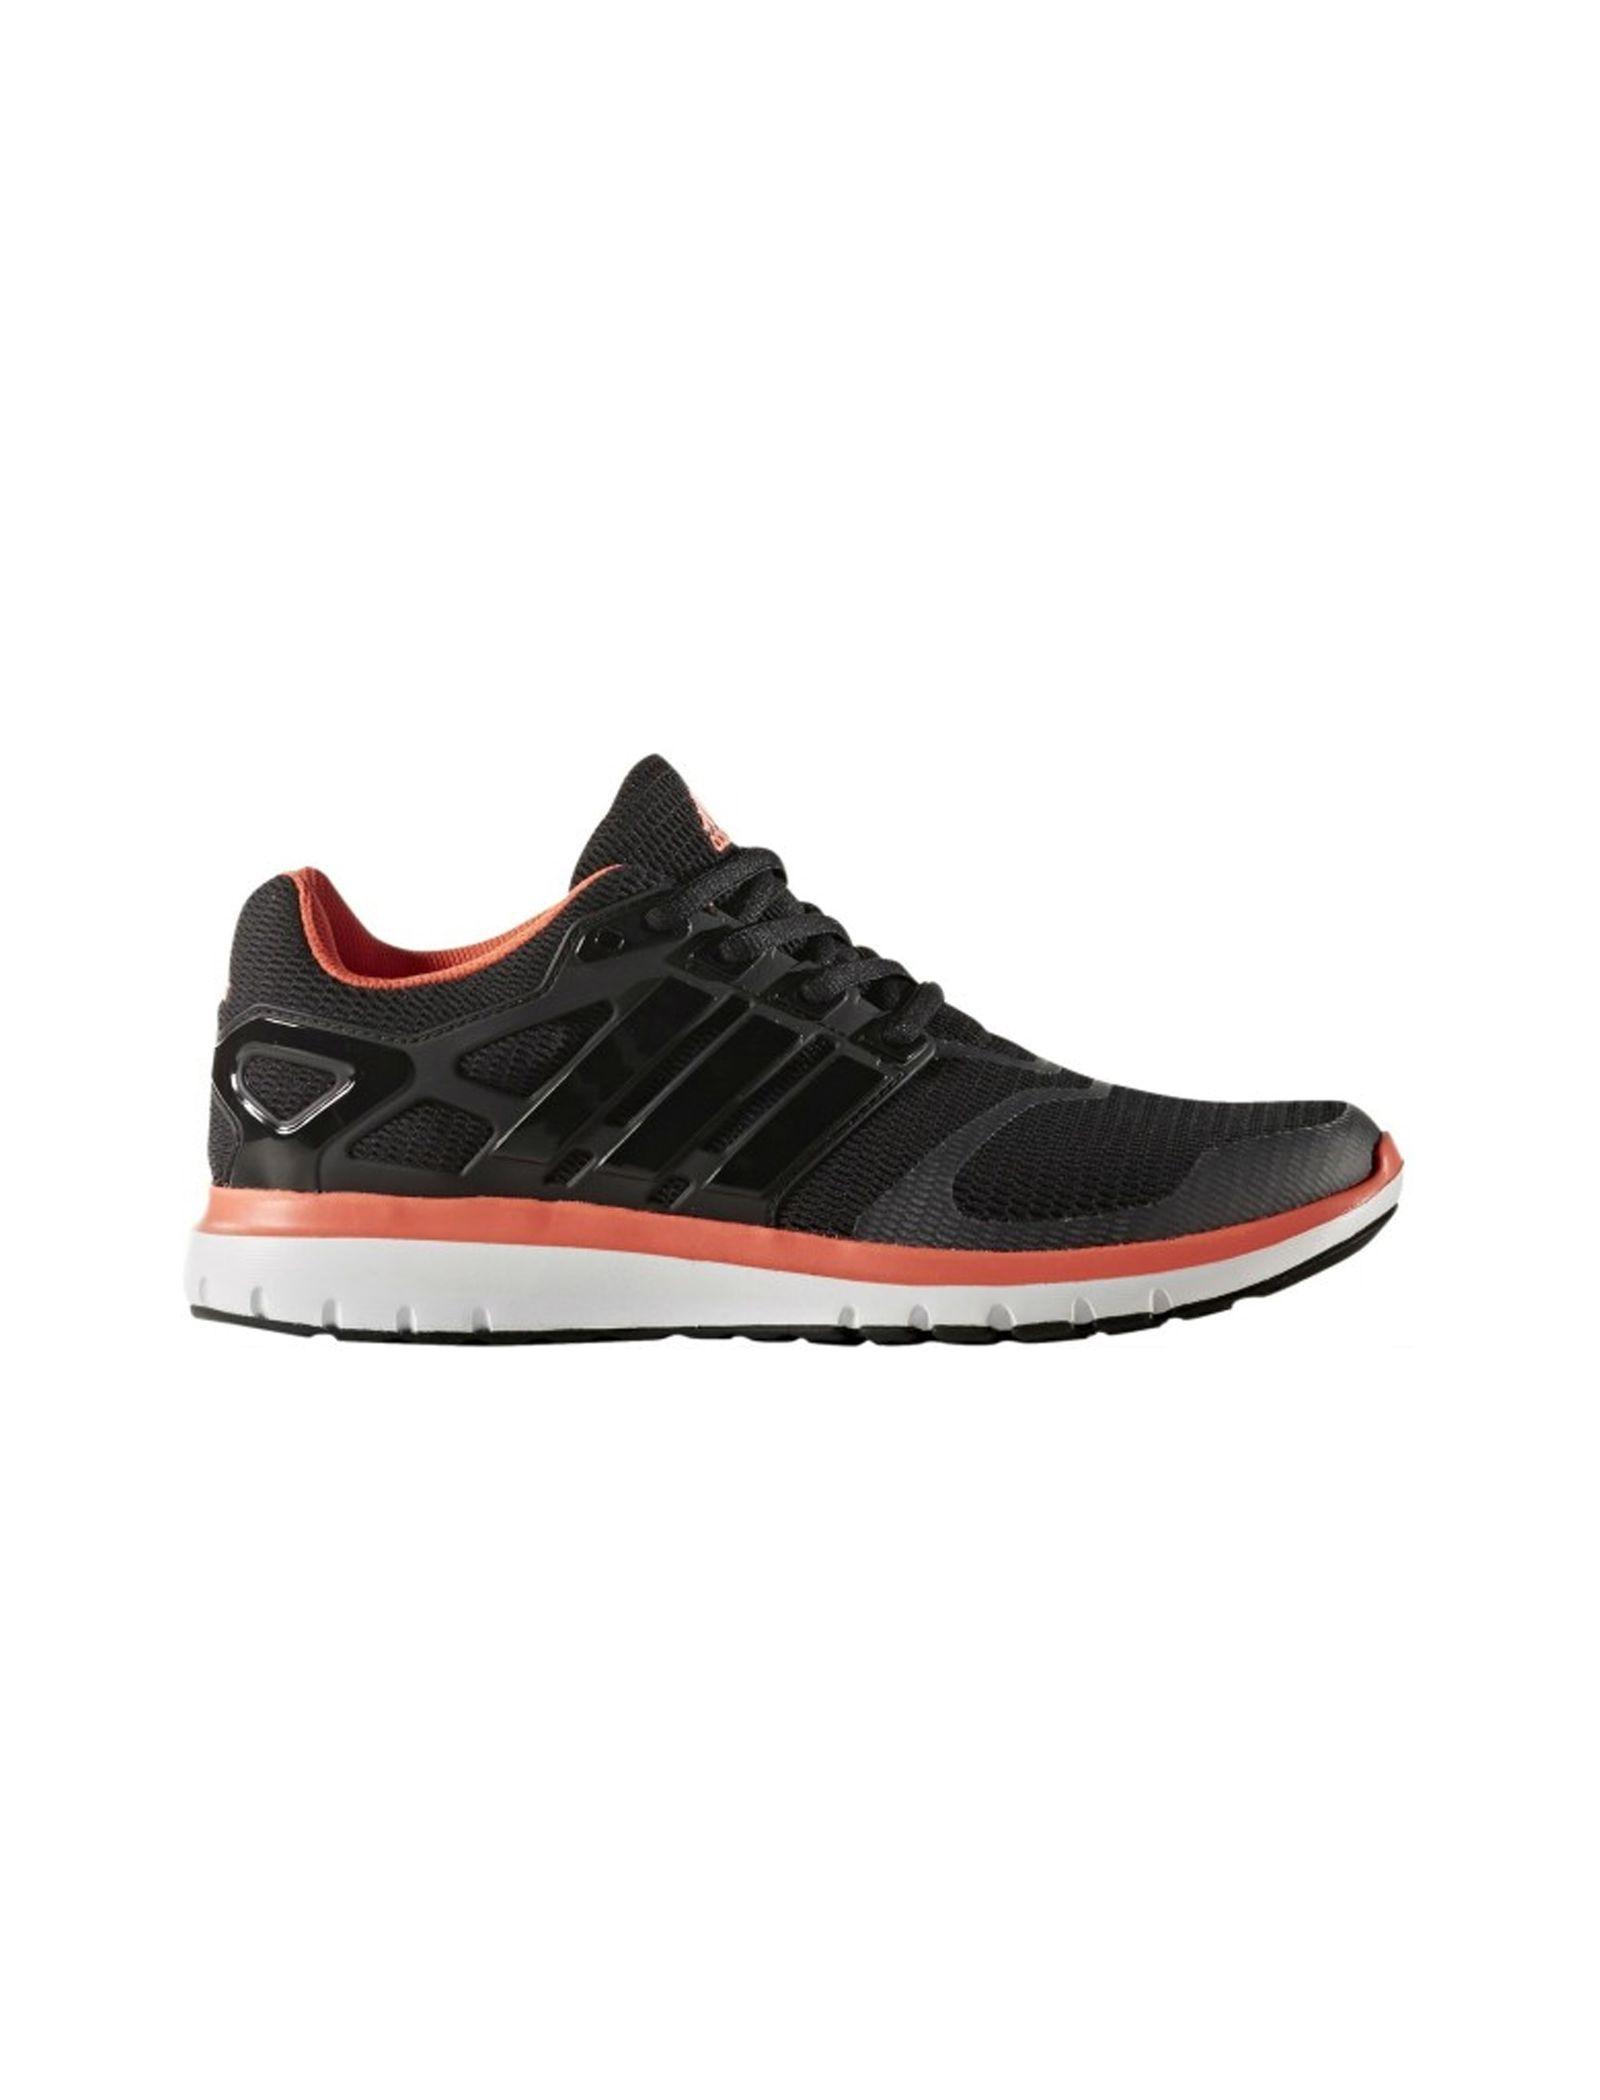 کفش دویدن بندی زنانه Energy Cloud V - آدیداس - مشکي و نارنجي - 1